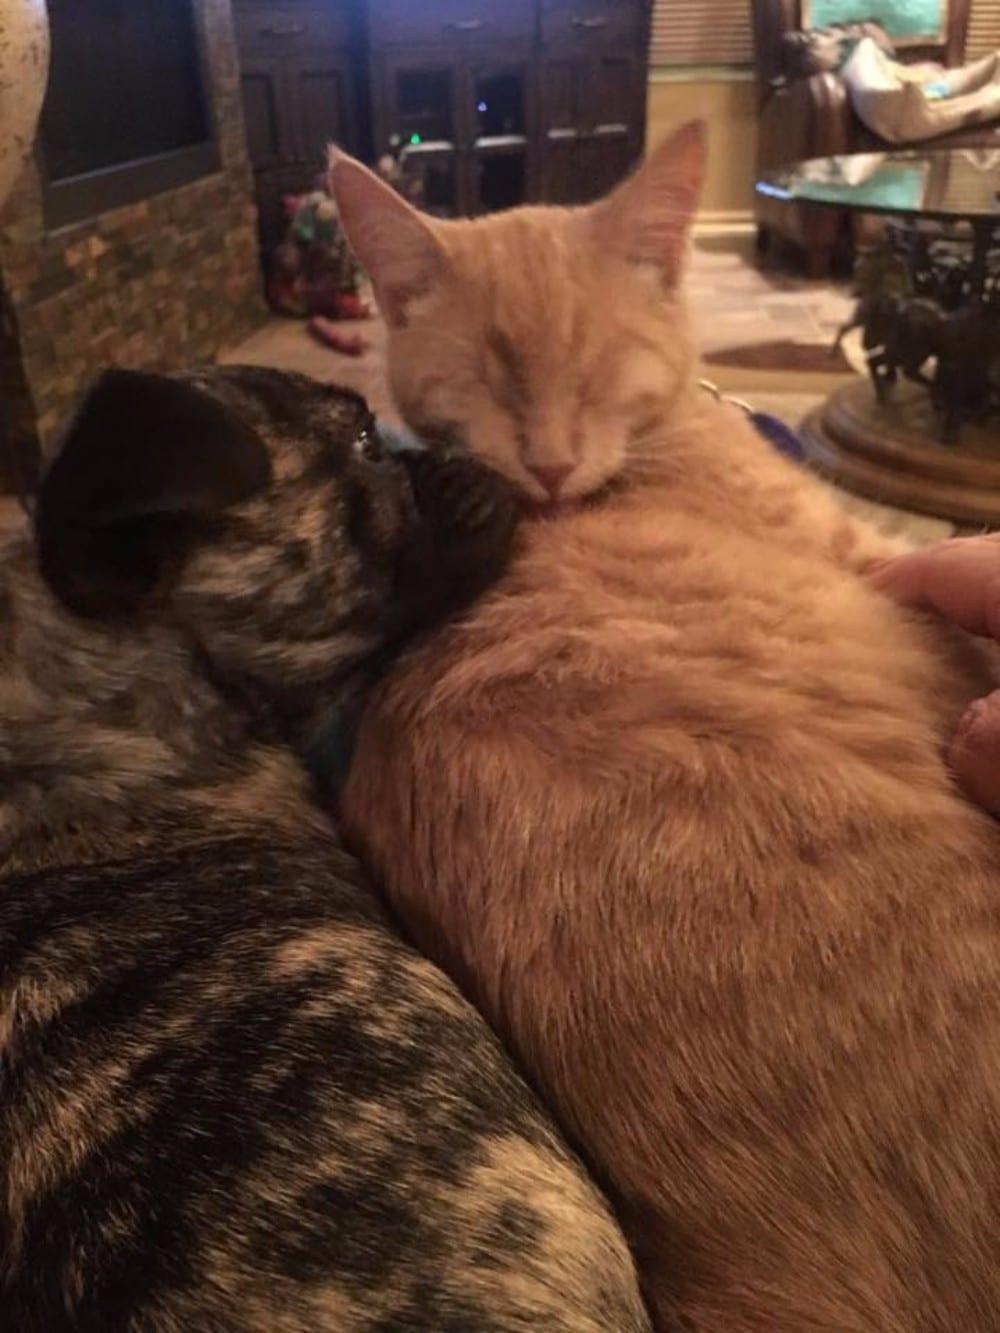 gato y perro echando la siesta